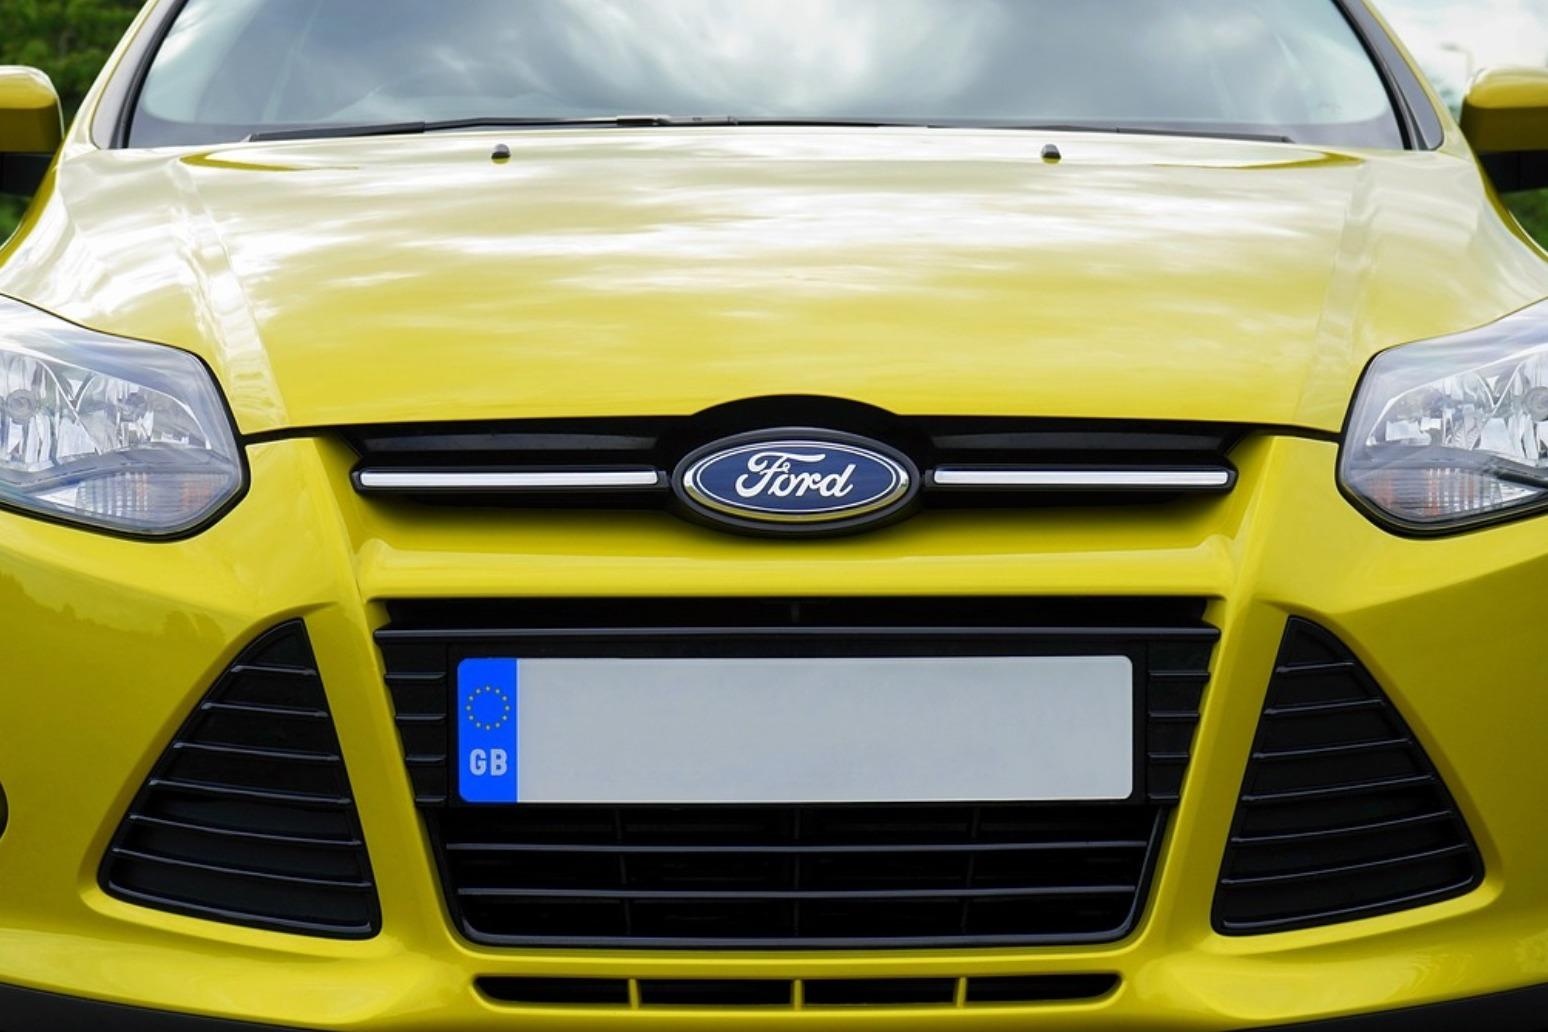 Ford restarts UK car production